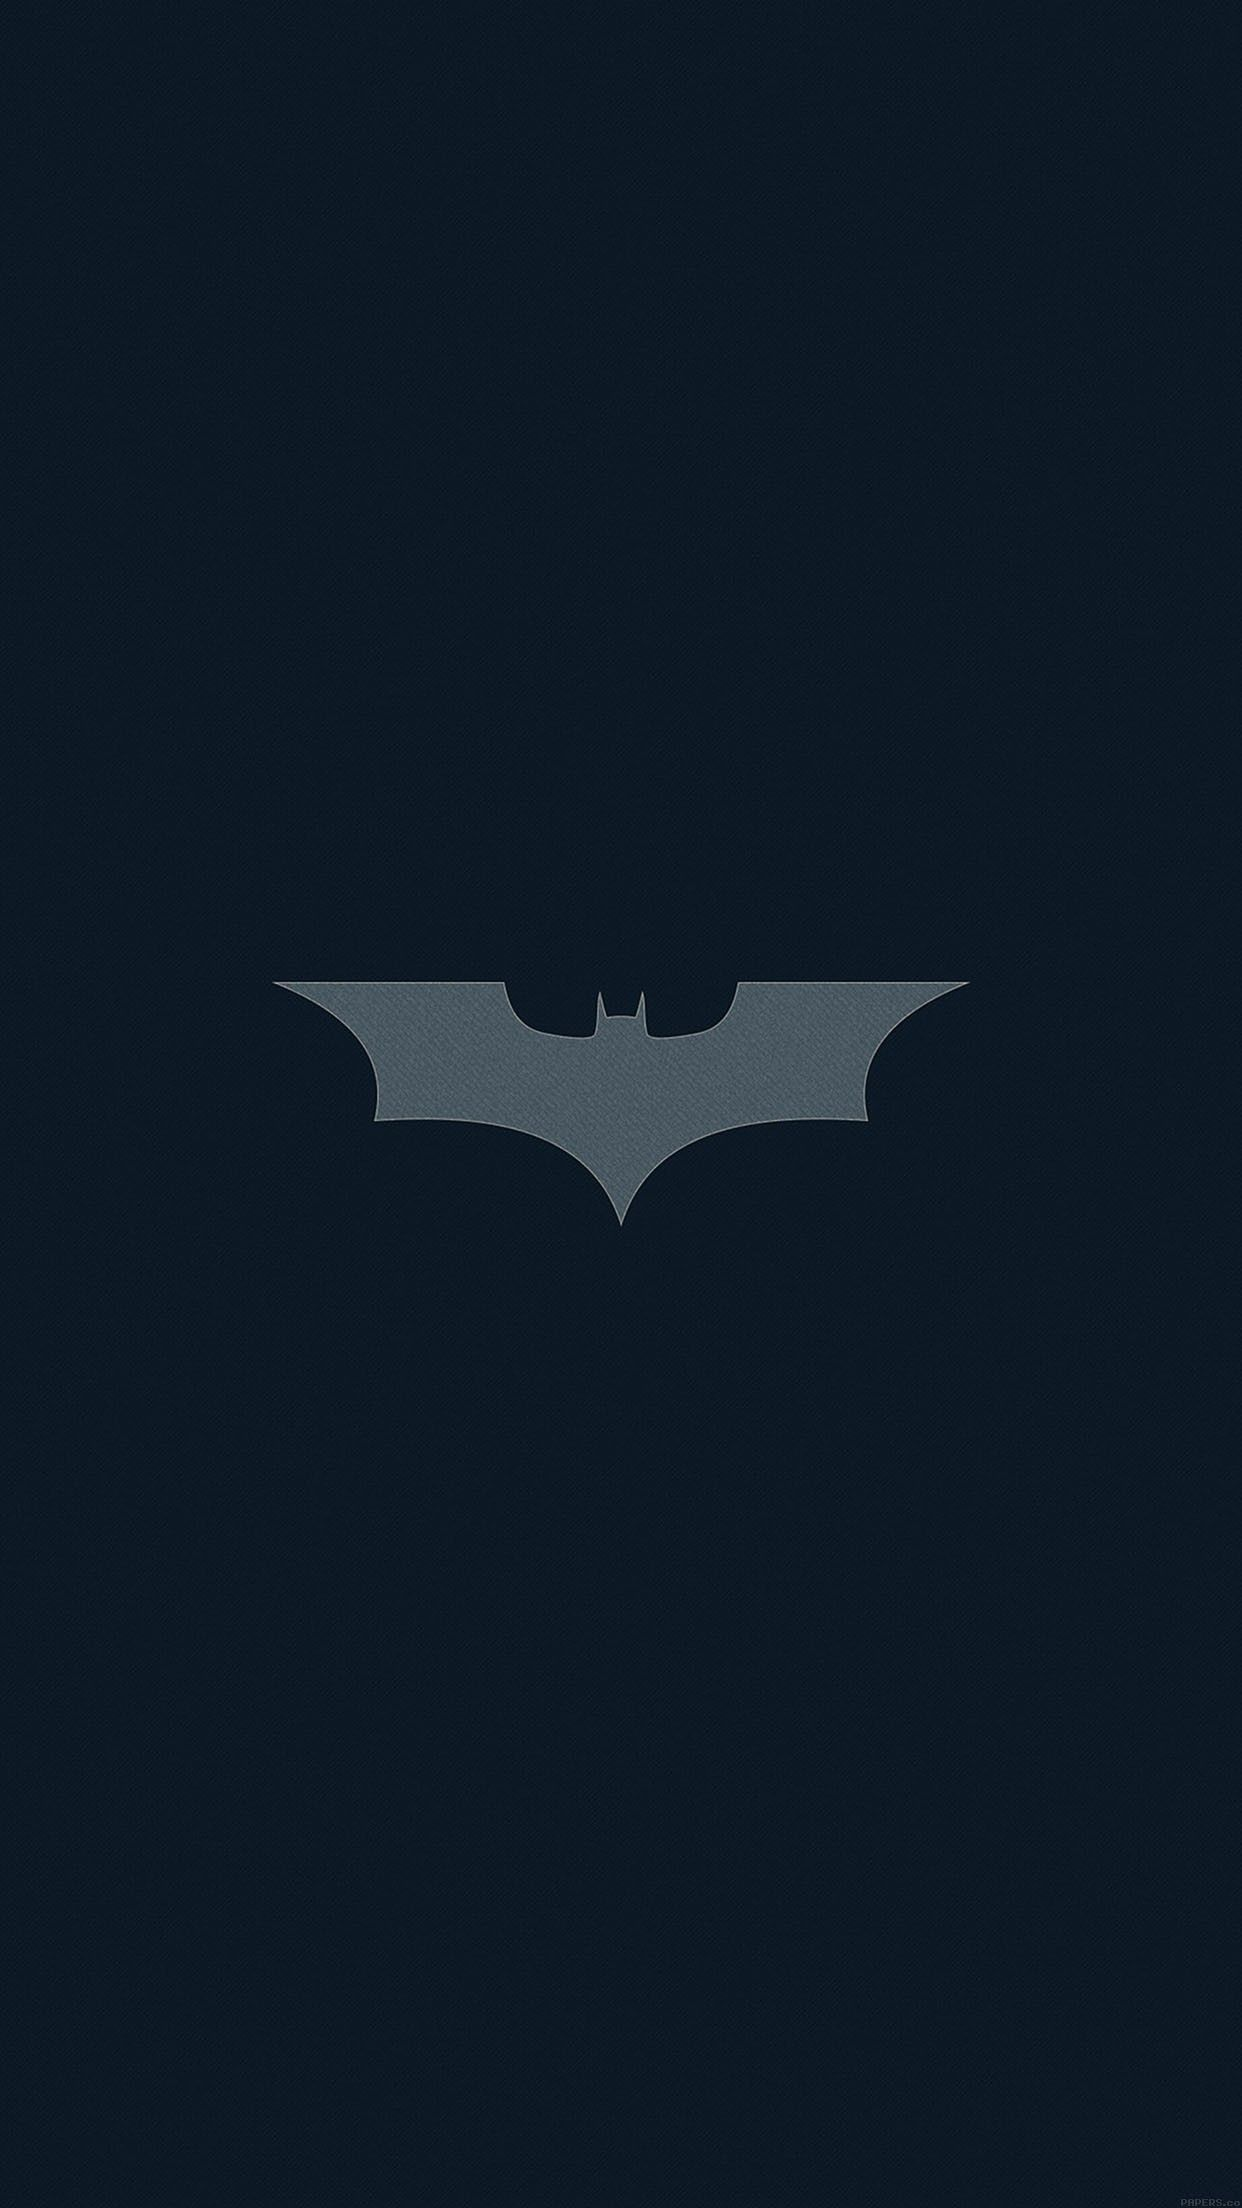 Batman Iphone 6 Wallpaper Source Logo 7 Wallpapersimages Org